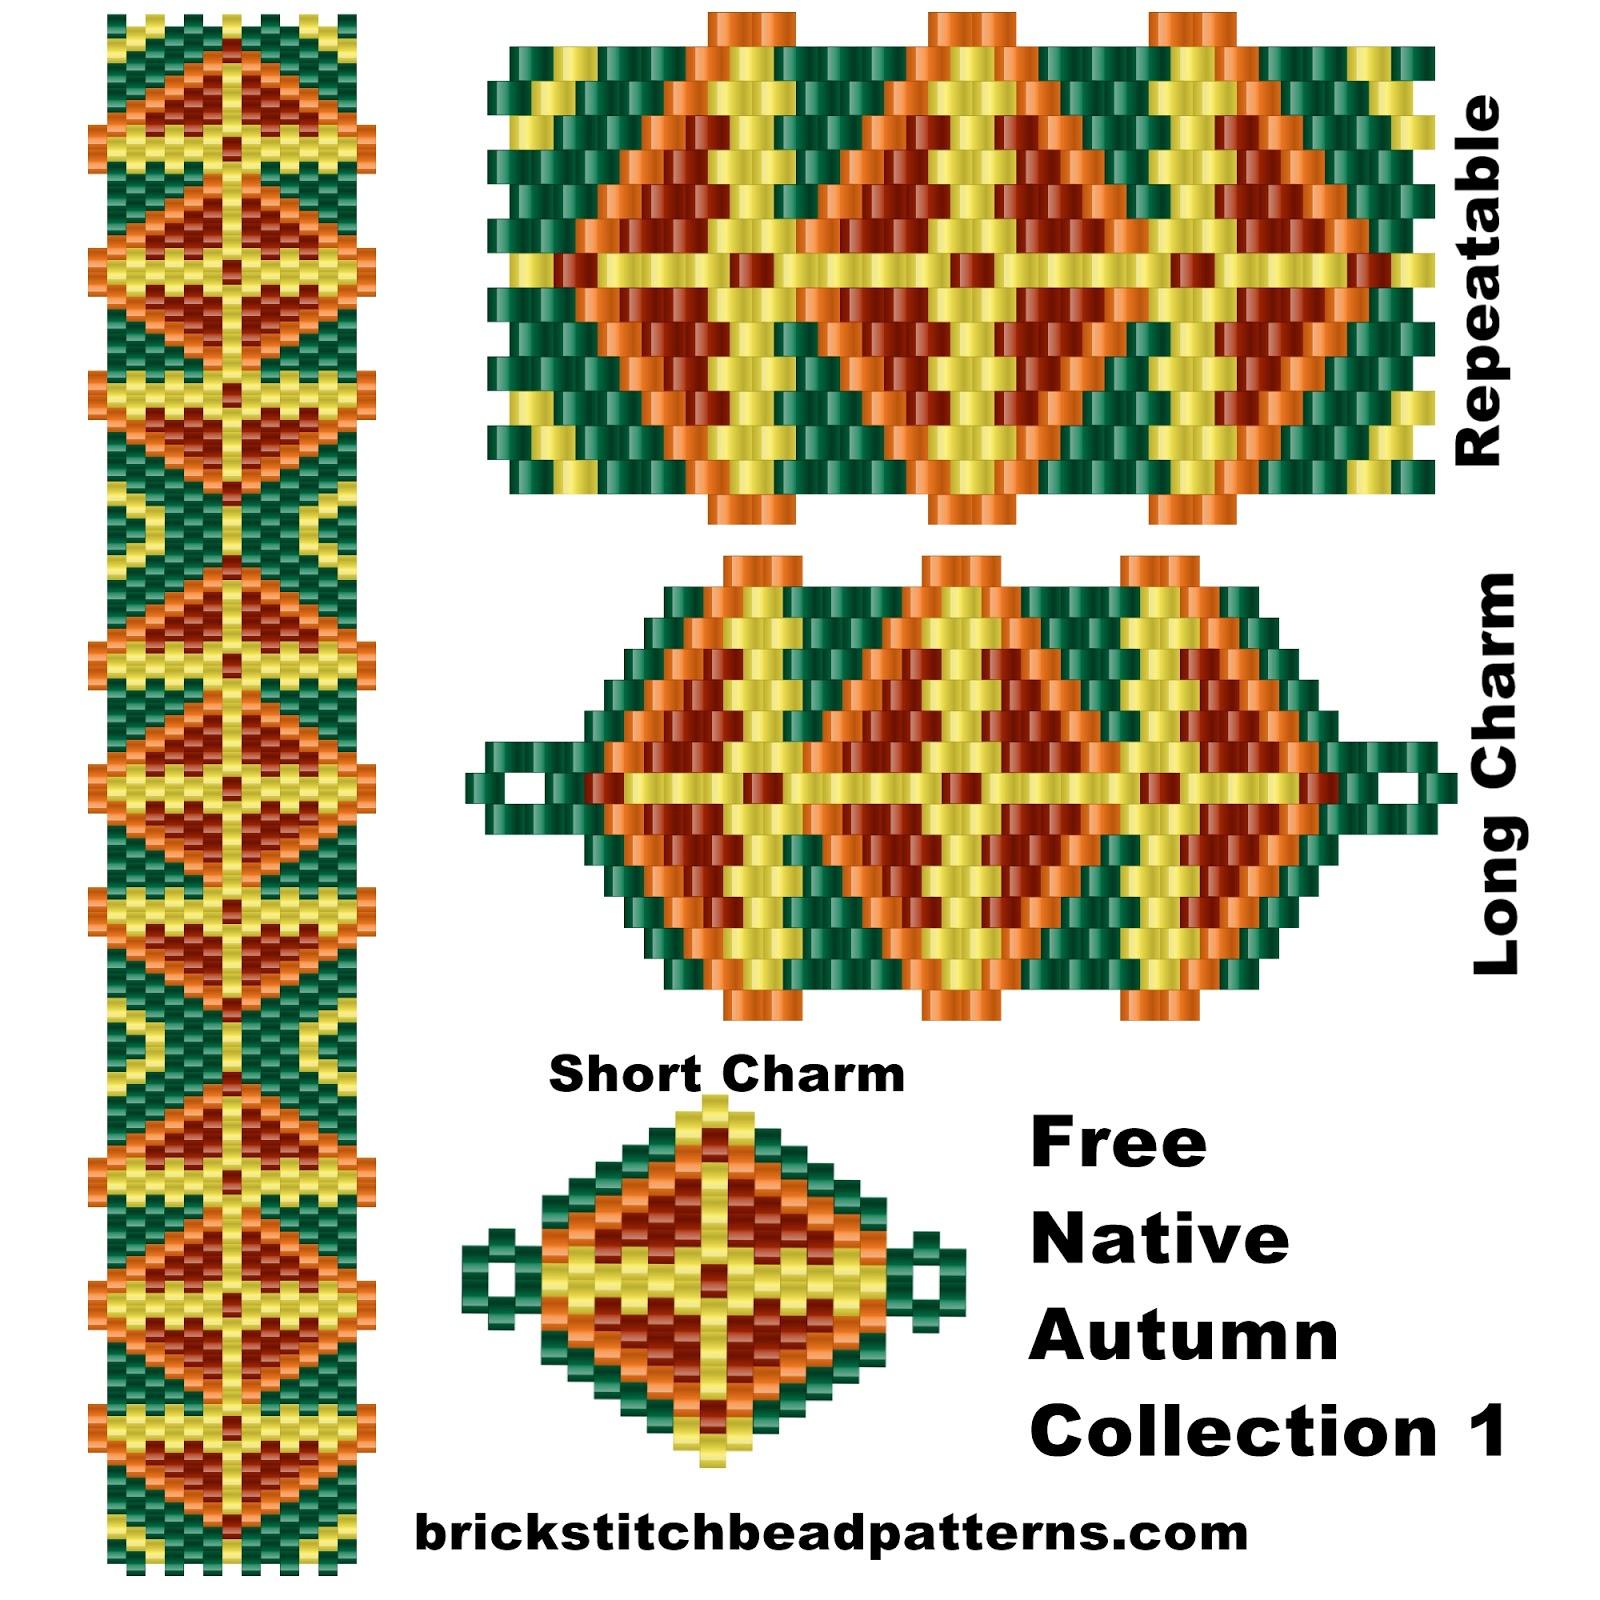 Brick Stitch Bead Patterns Journal Free Native Autumn